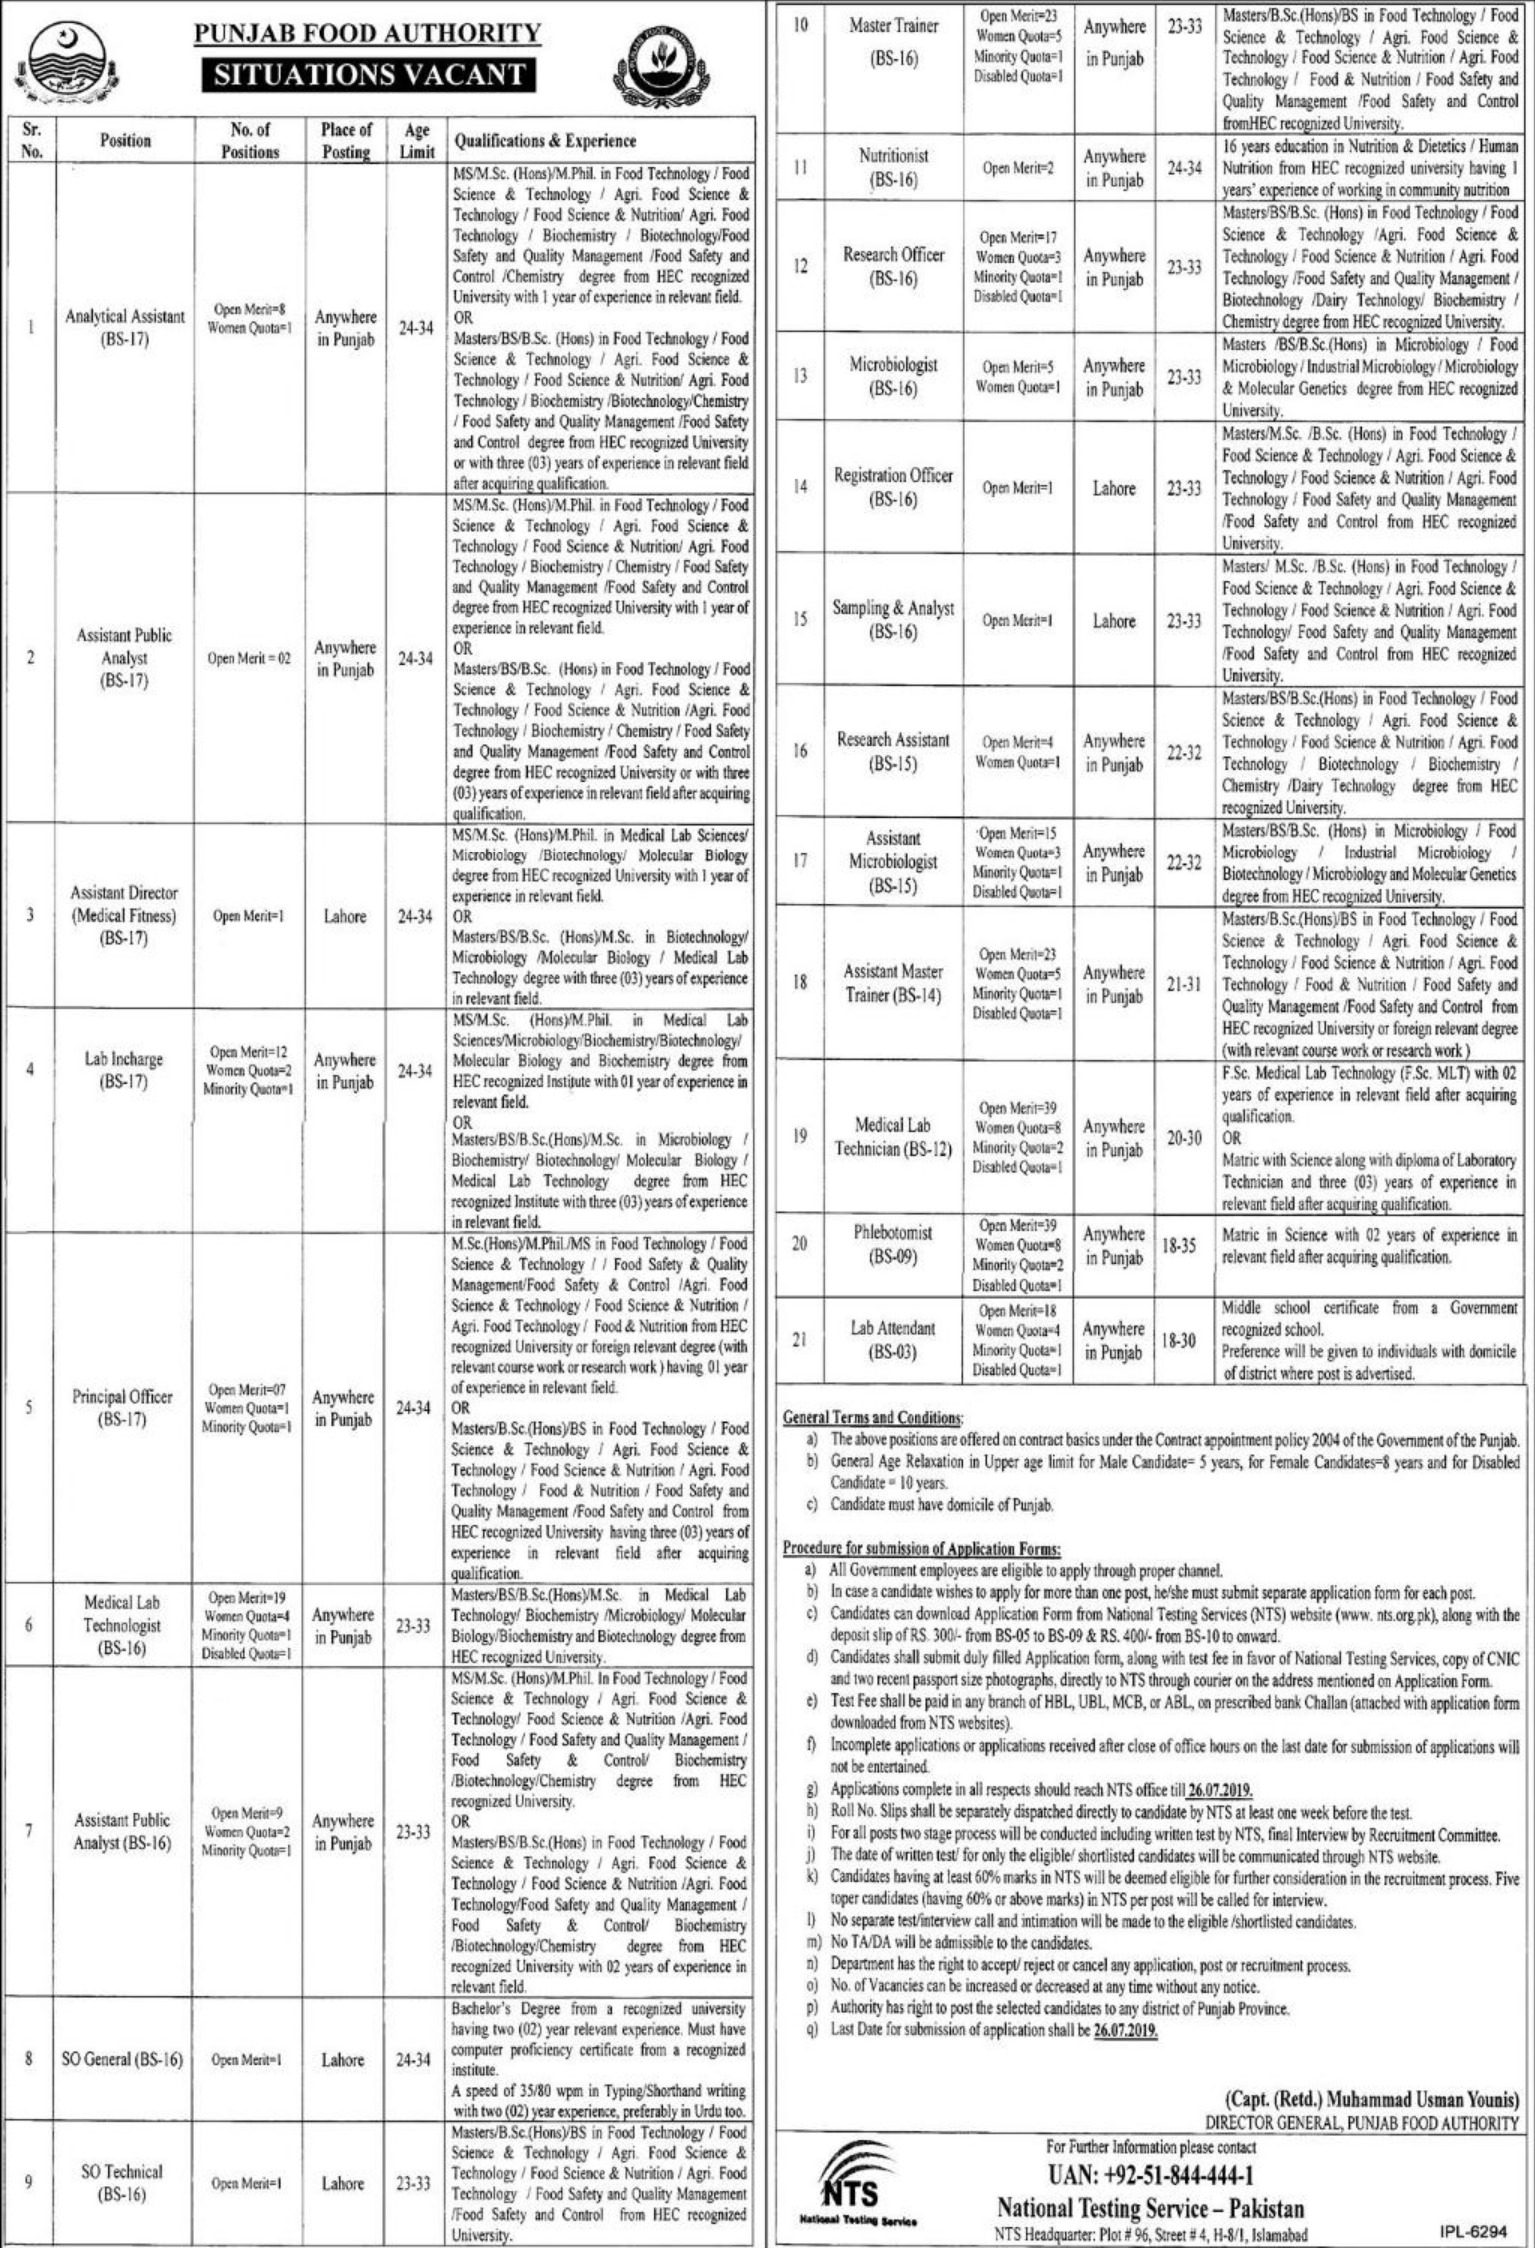 Punjab Food Authority NTS Jobs 2019 Application form eligibility criteria